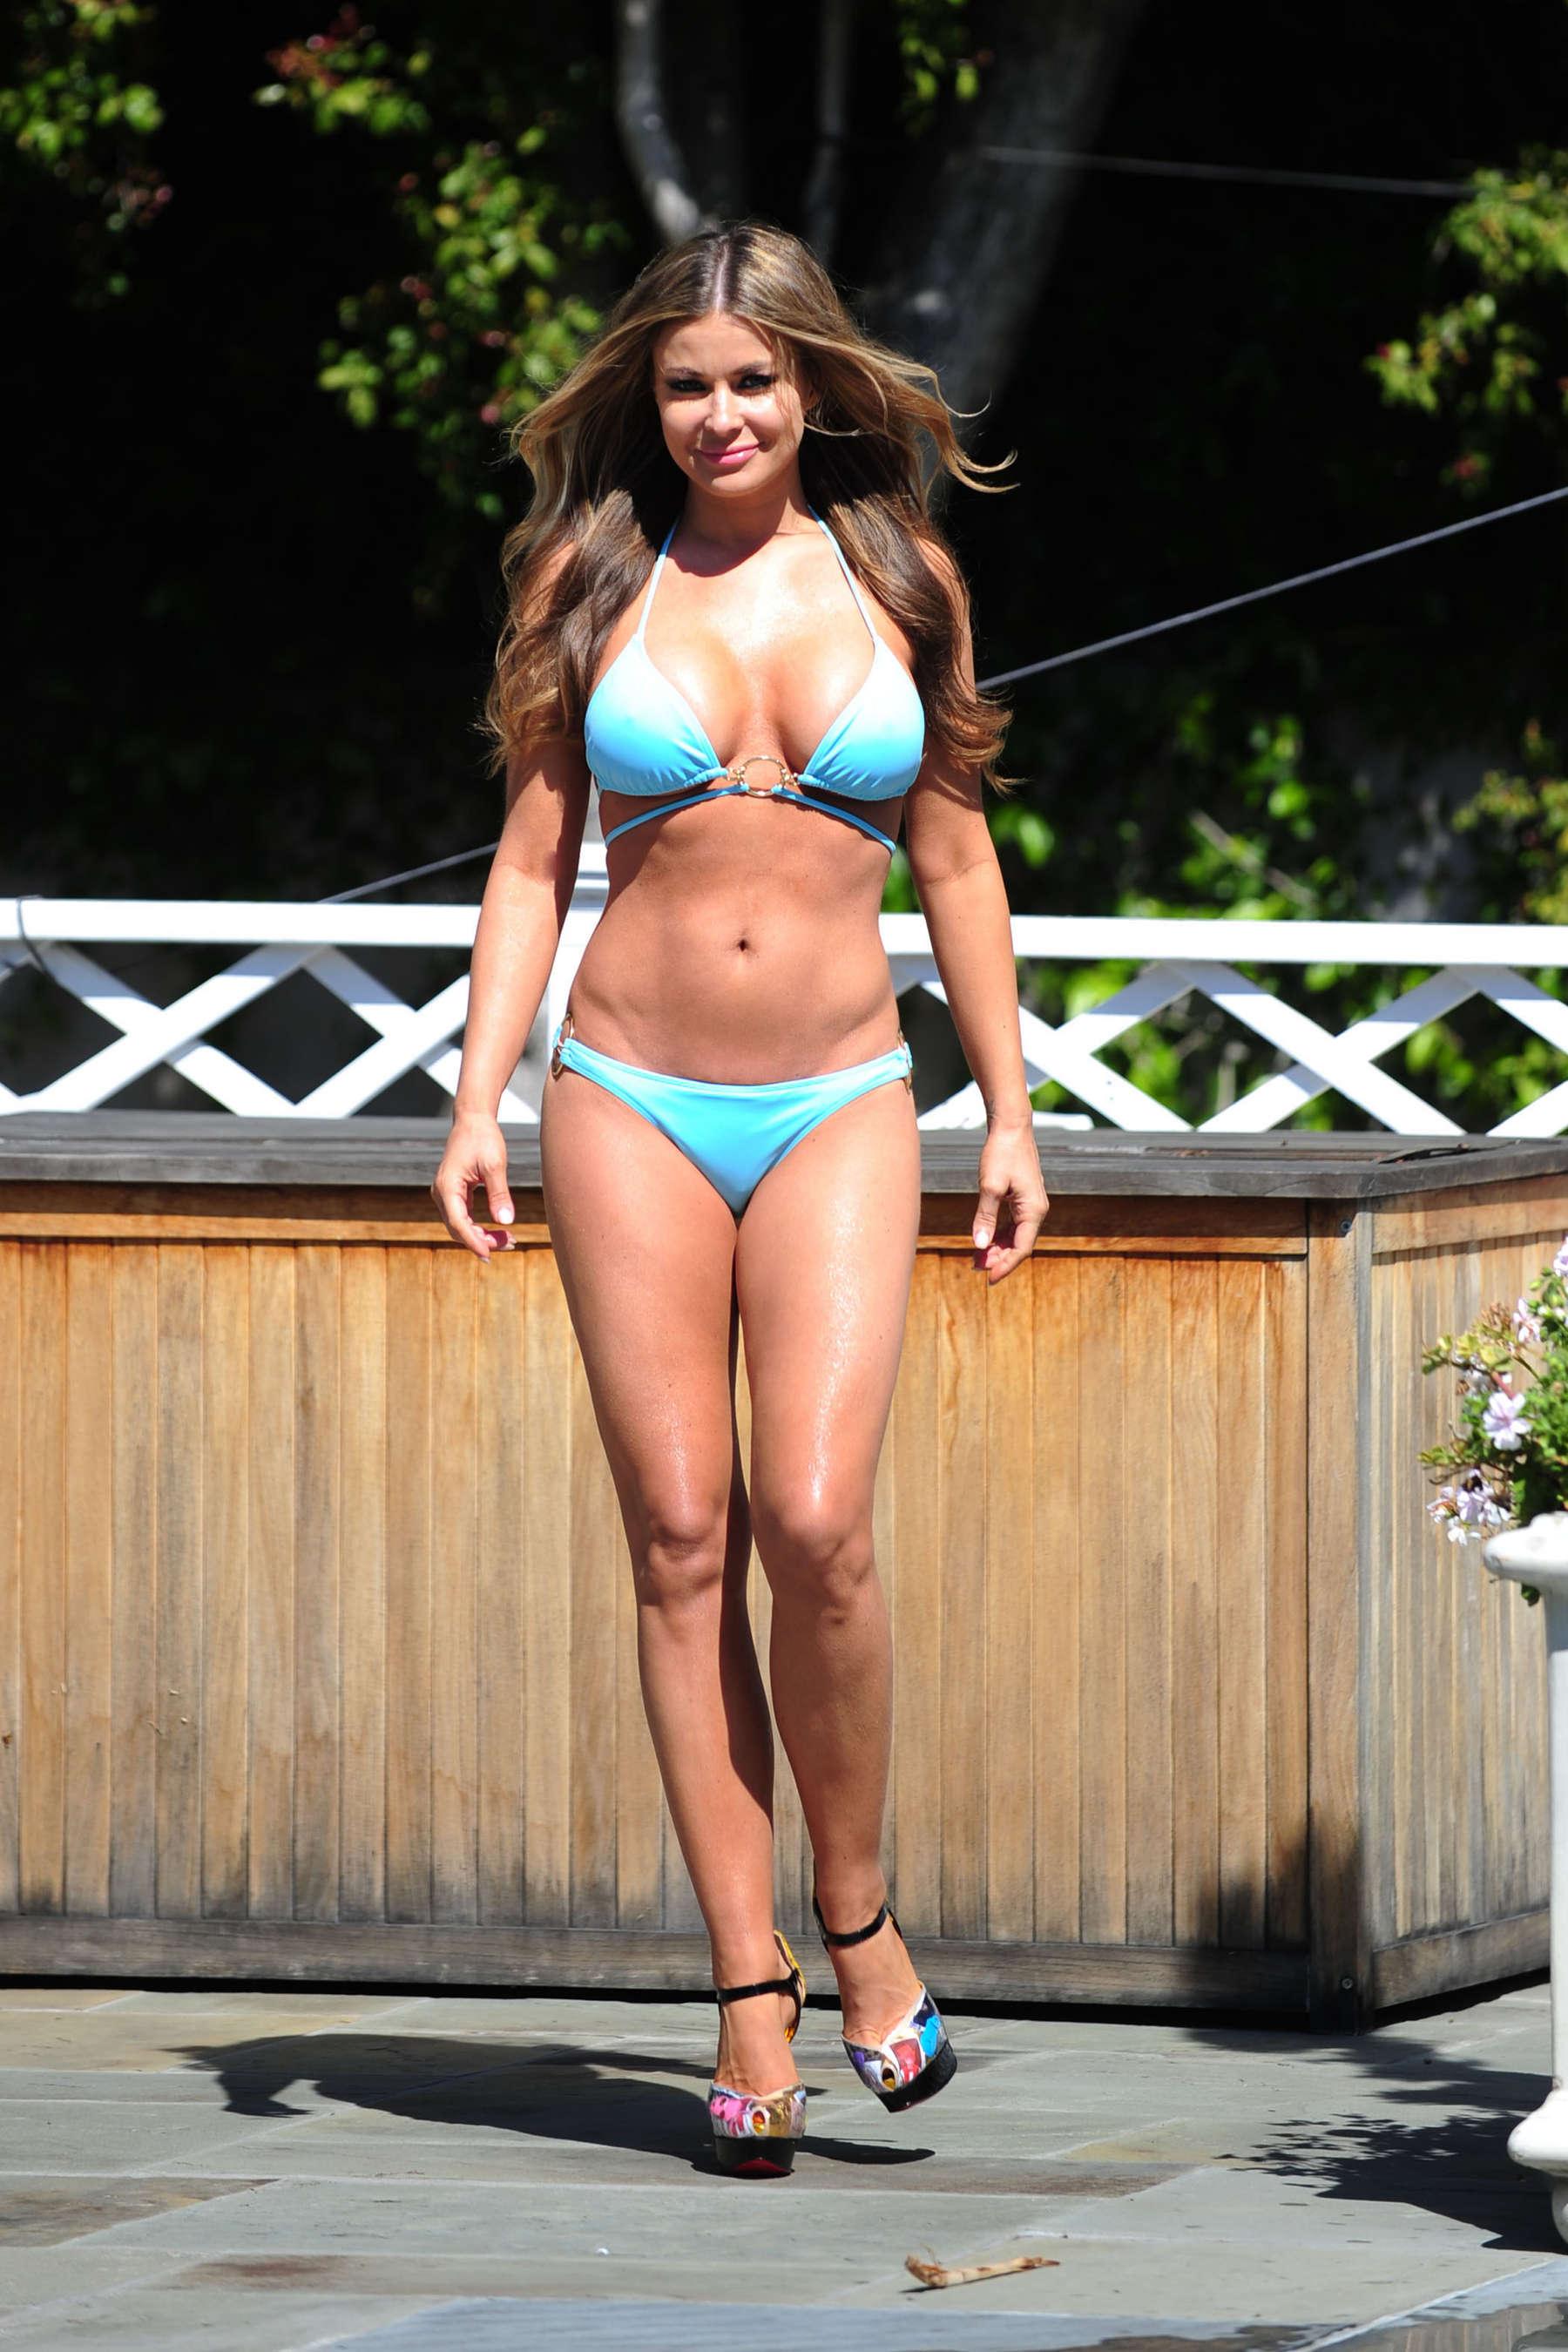 Back to post Carmen Electra – Bikini photoshoot at her house in LA: http://www.gotceleb.com/carmen-electra-bikini-photoshoot-at-her-house-in-la-2012-05-09.html/carmen-electra-bikini-photoshoot-at-her-house-in-la-26